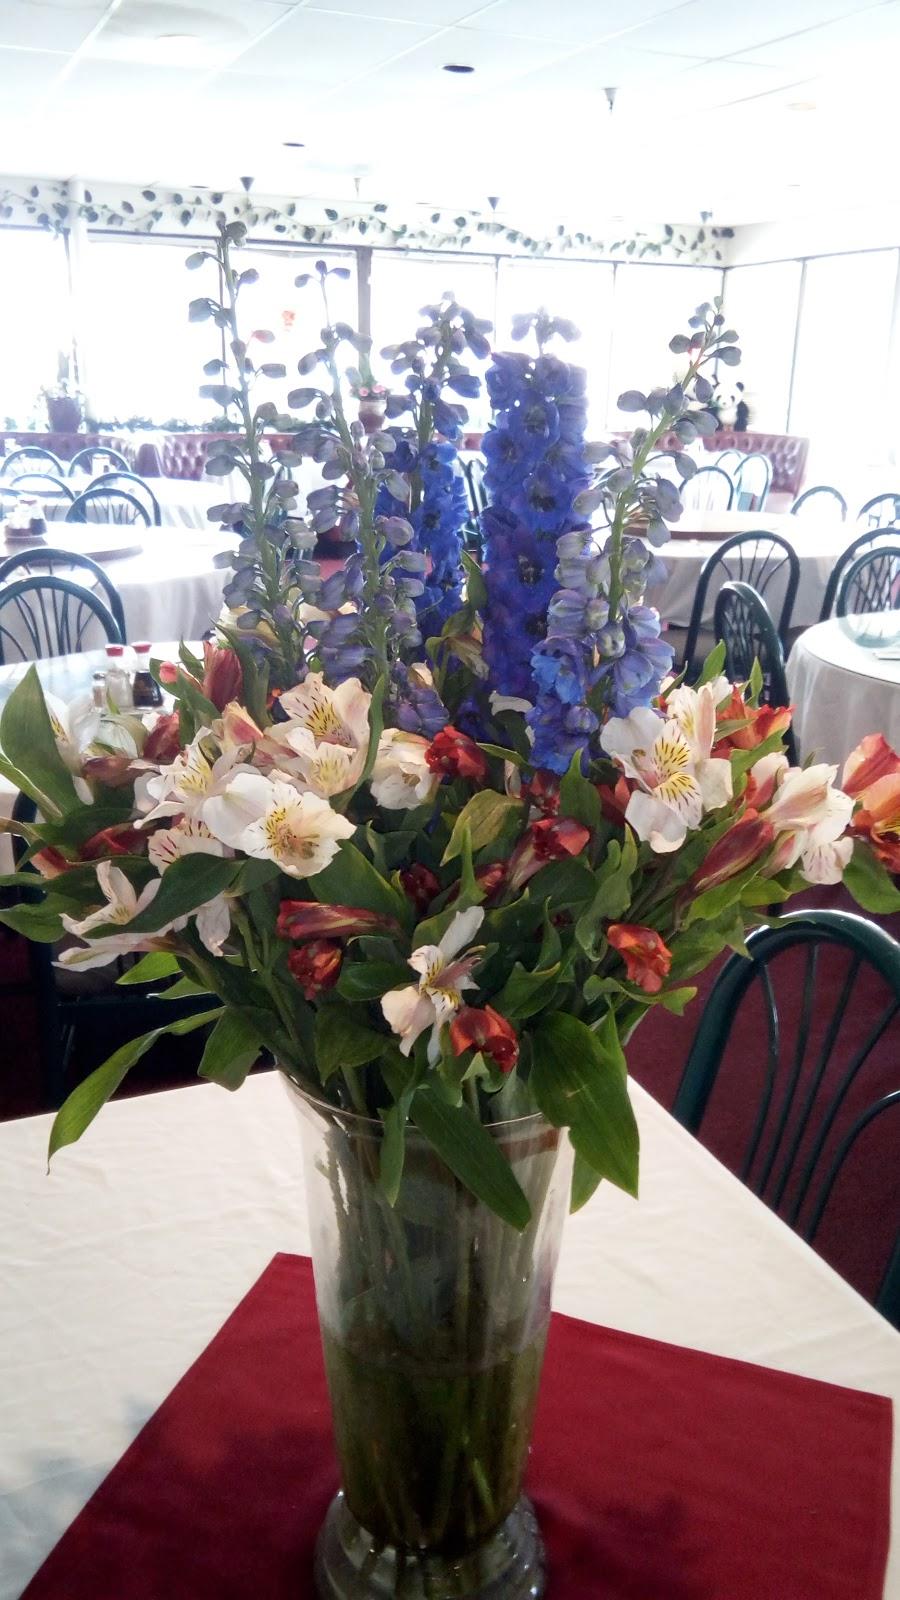 Peking Restaurant - restaurant  | Photo 6 of 10 | Address: 9529 Folsom Blvd, Sacramento, CA 95827, USA | Phone: (916) 363-3959